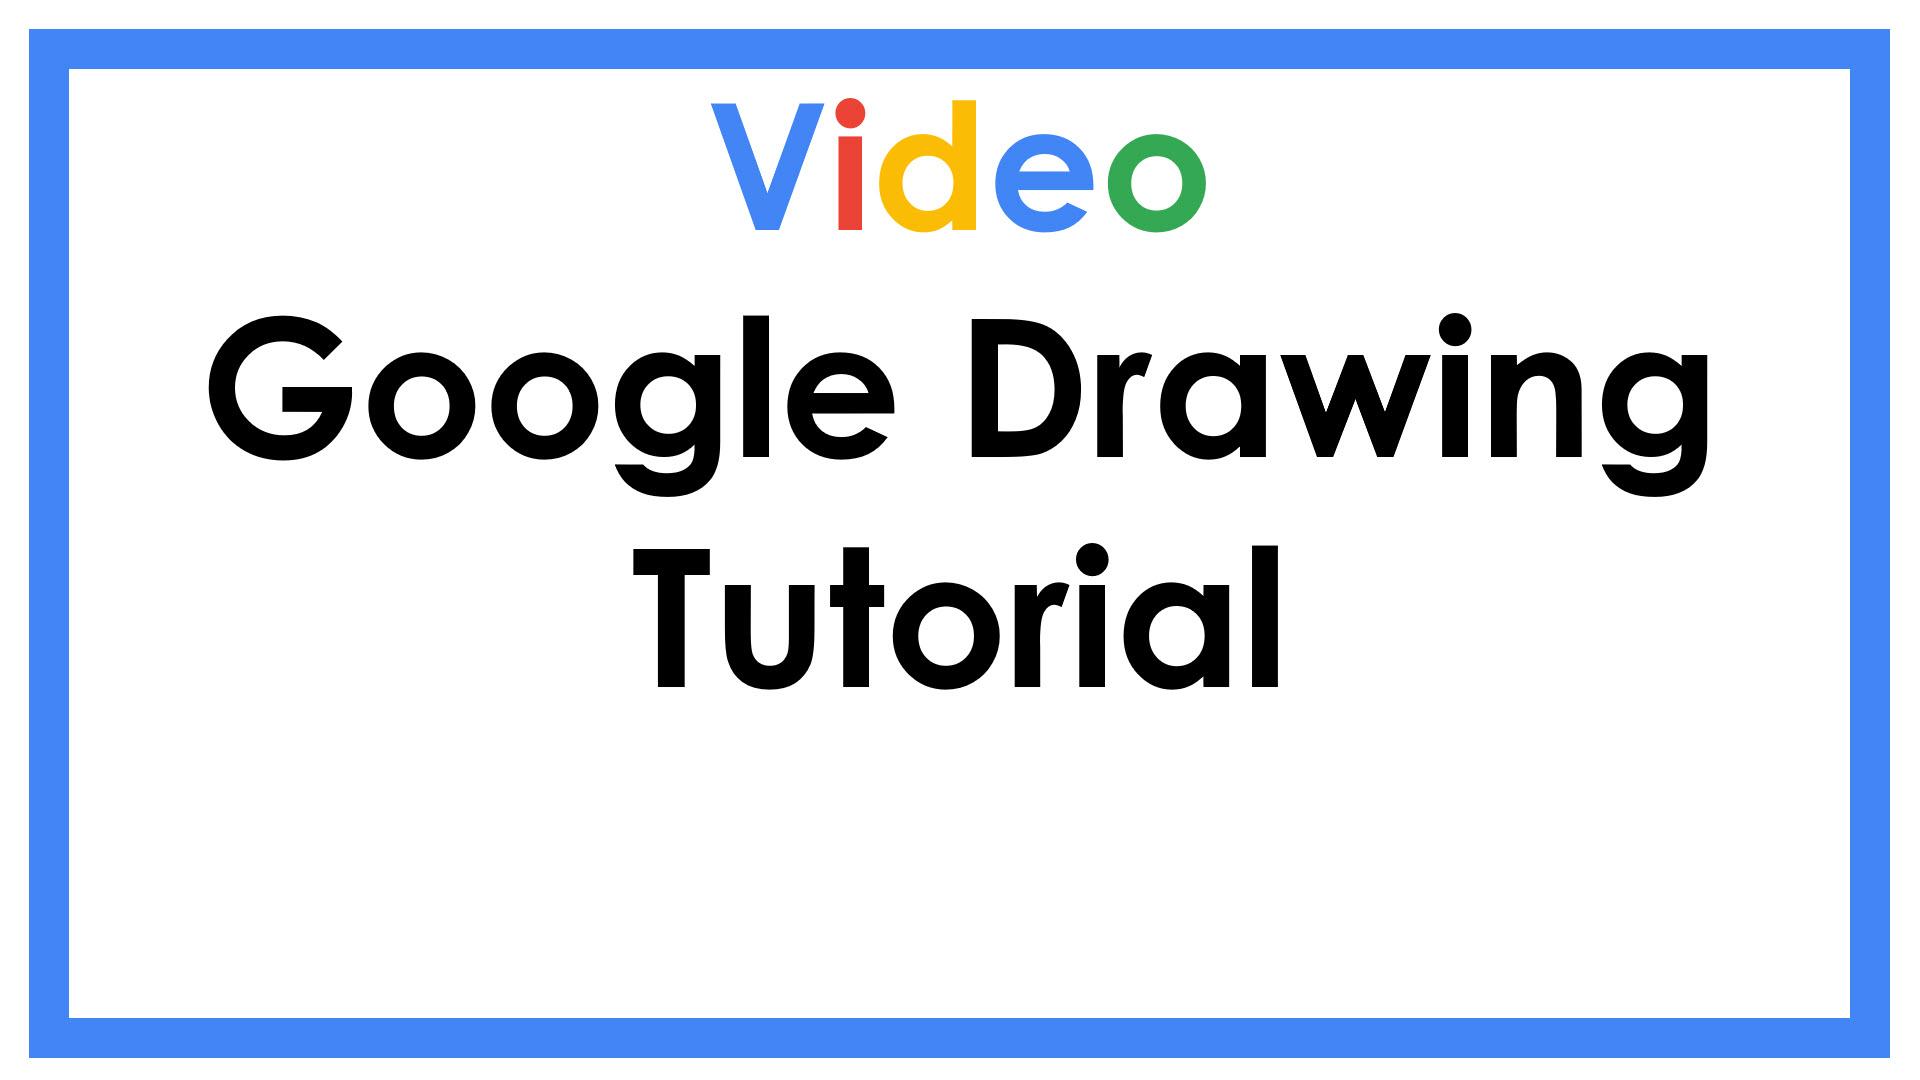 Google Drawing Tutorial